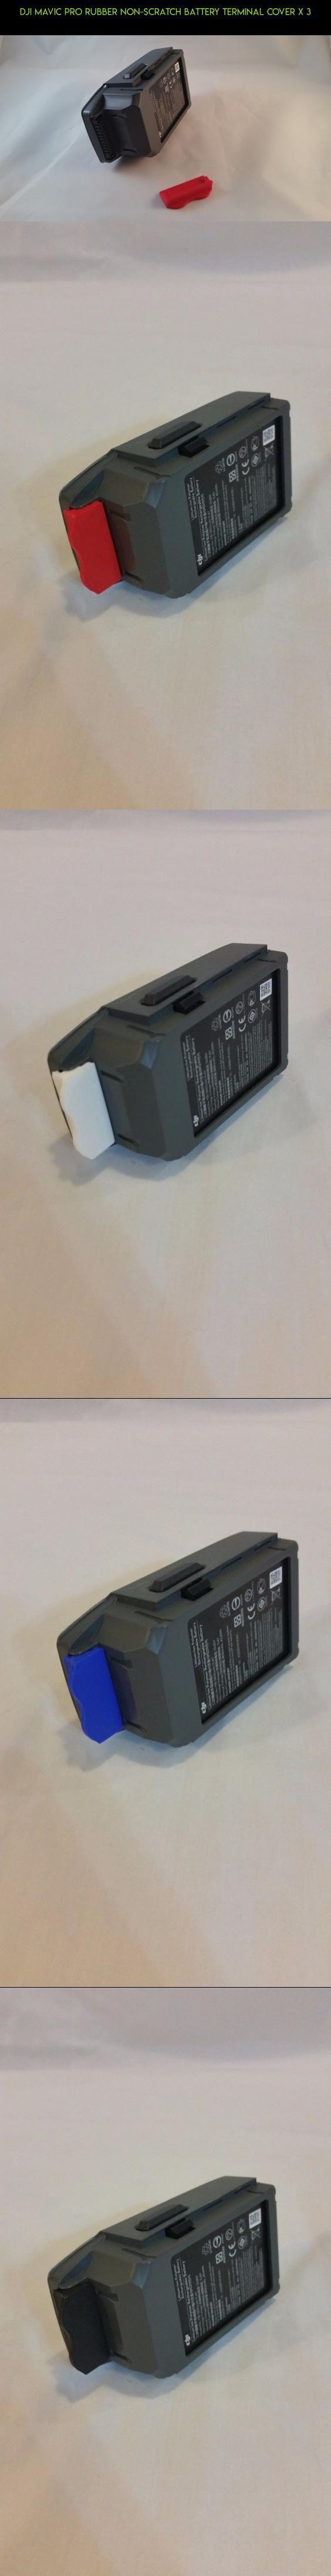 DJI Mavic Pro Rubber non-scratch Battery Terminal Cover x 3 #products #shopping #racing #pro #batteries #fpv #kit #drone #parts #camera #tech #gadgets #plans #3 #technology #mavic